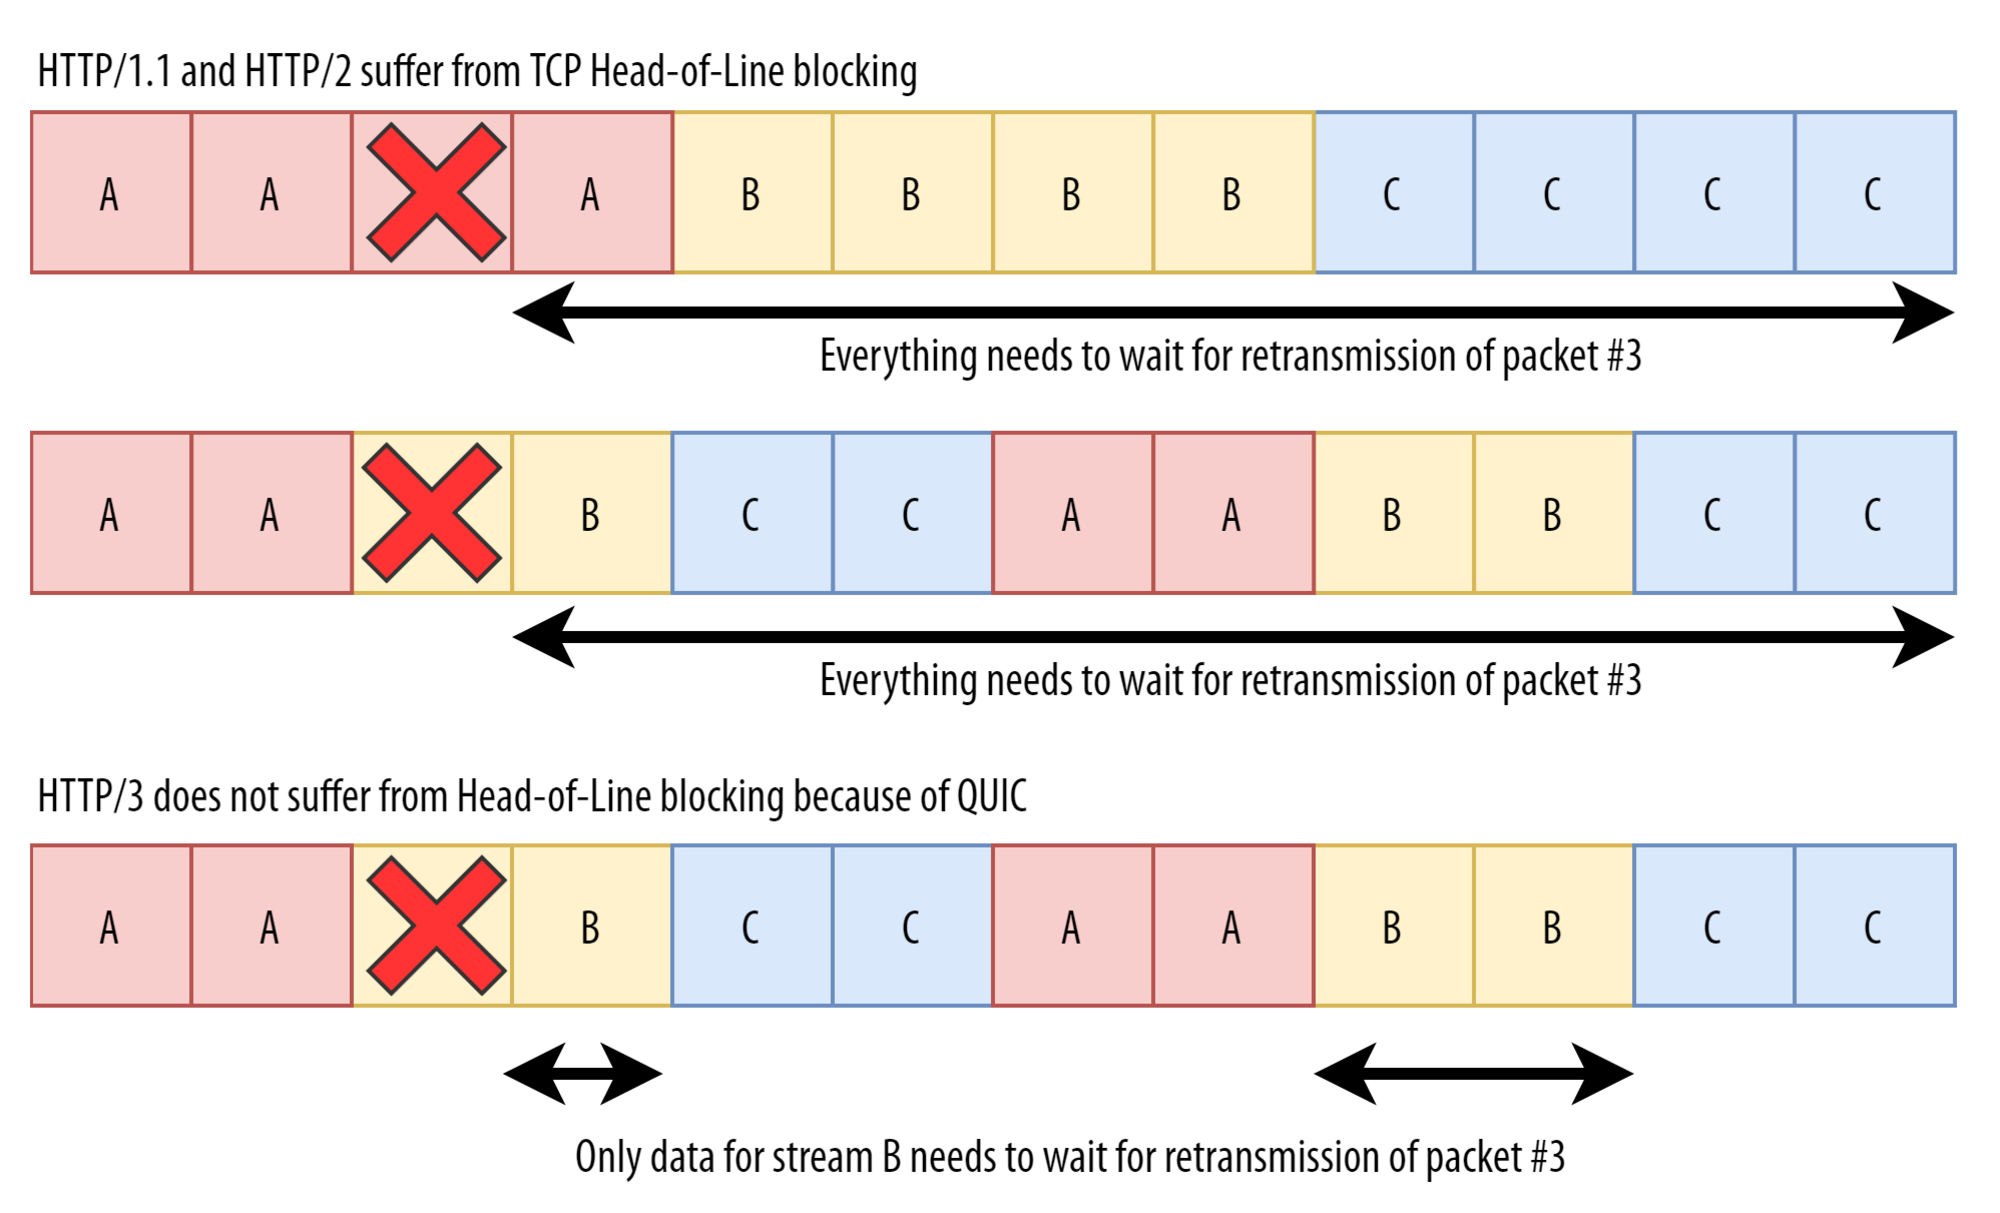 https://res.cloudinary.com/indysigner/image/fetch/f_auto,q_80/w_2000/https://cloud.netlifyusercontent.com/assets/344dbf88-fdf9-42bb-adb4-46f01eedd629/7981cb82-395c-4484-8873-46fd92804b4d/hol-blocking-basic.png